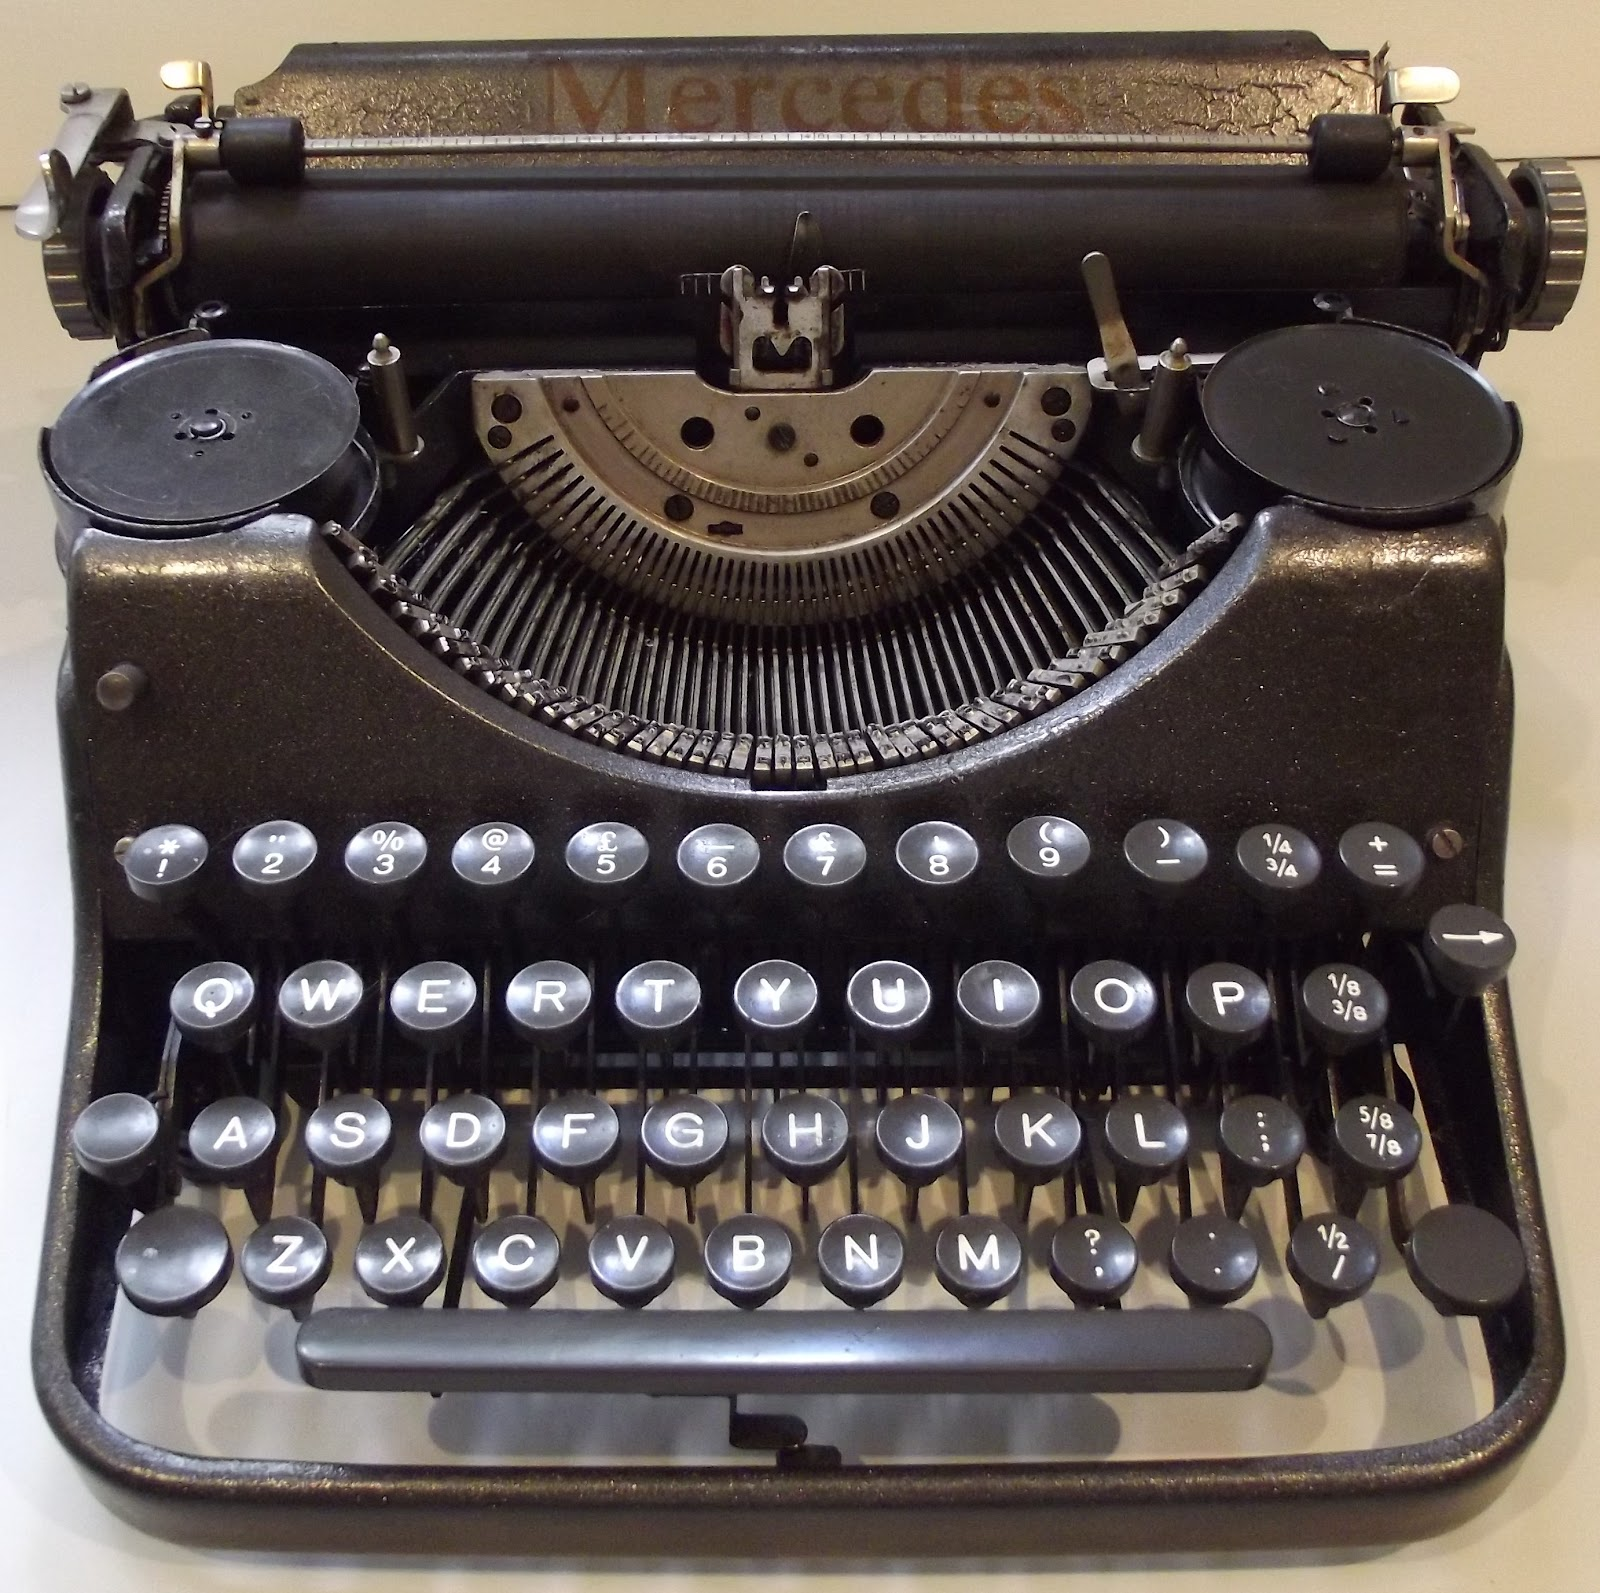 oz typewriter mercedes typewriters. Black Bedroom Furniture Sets. Home Design Ideas